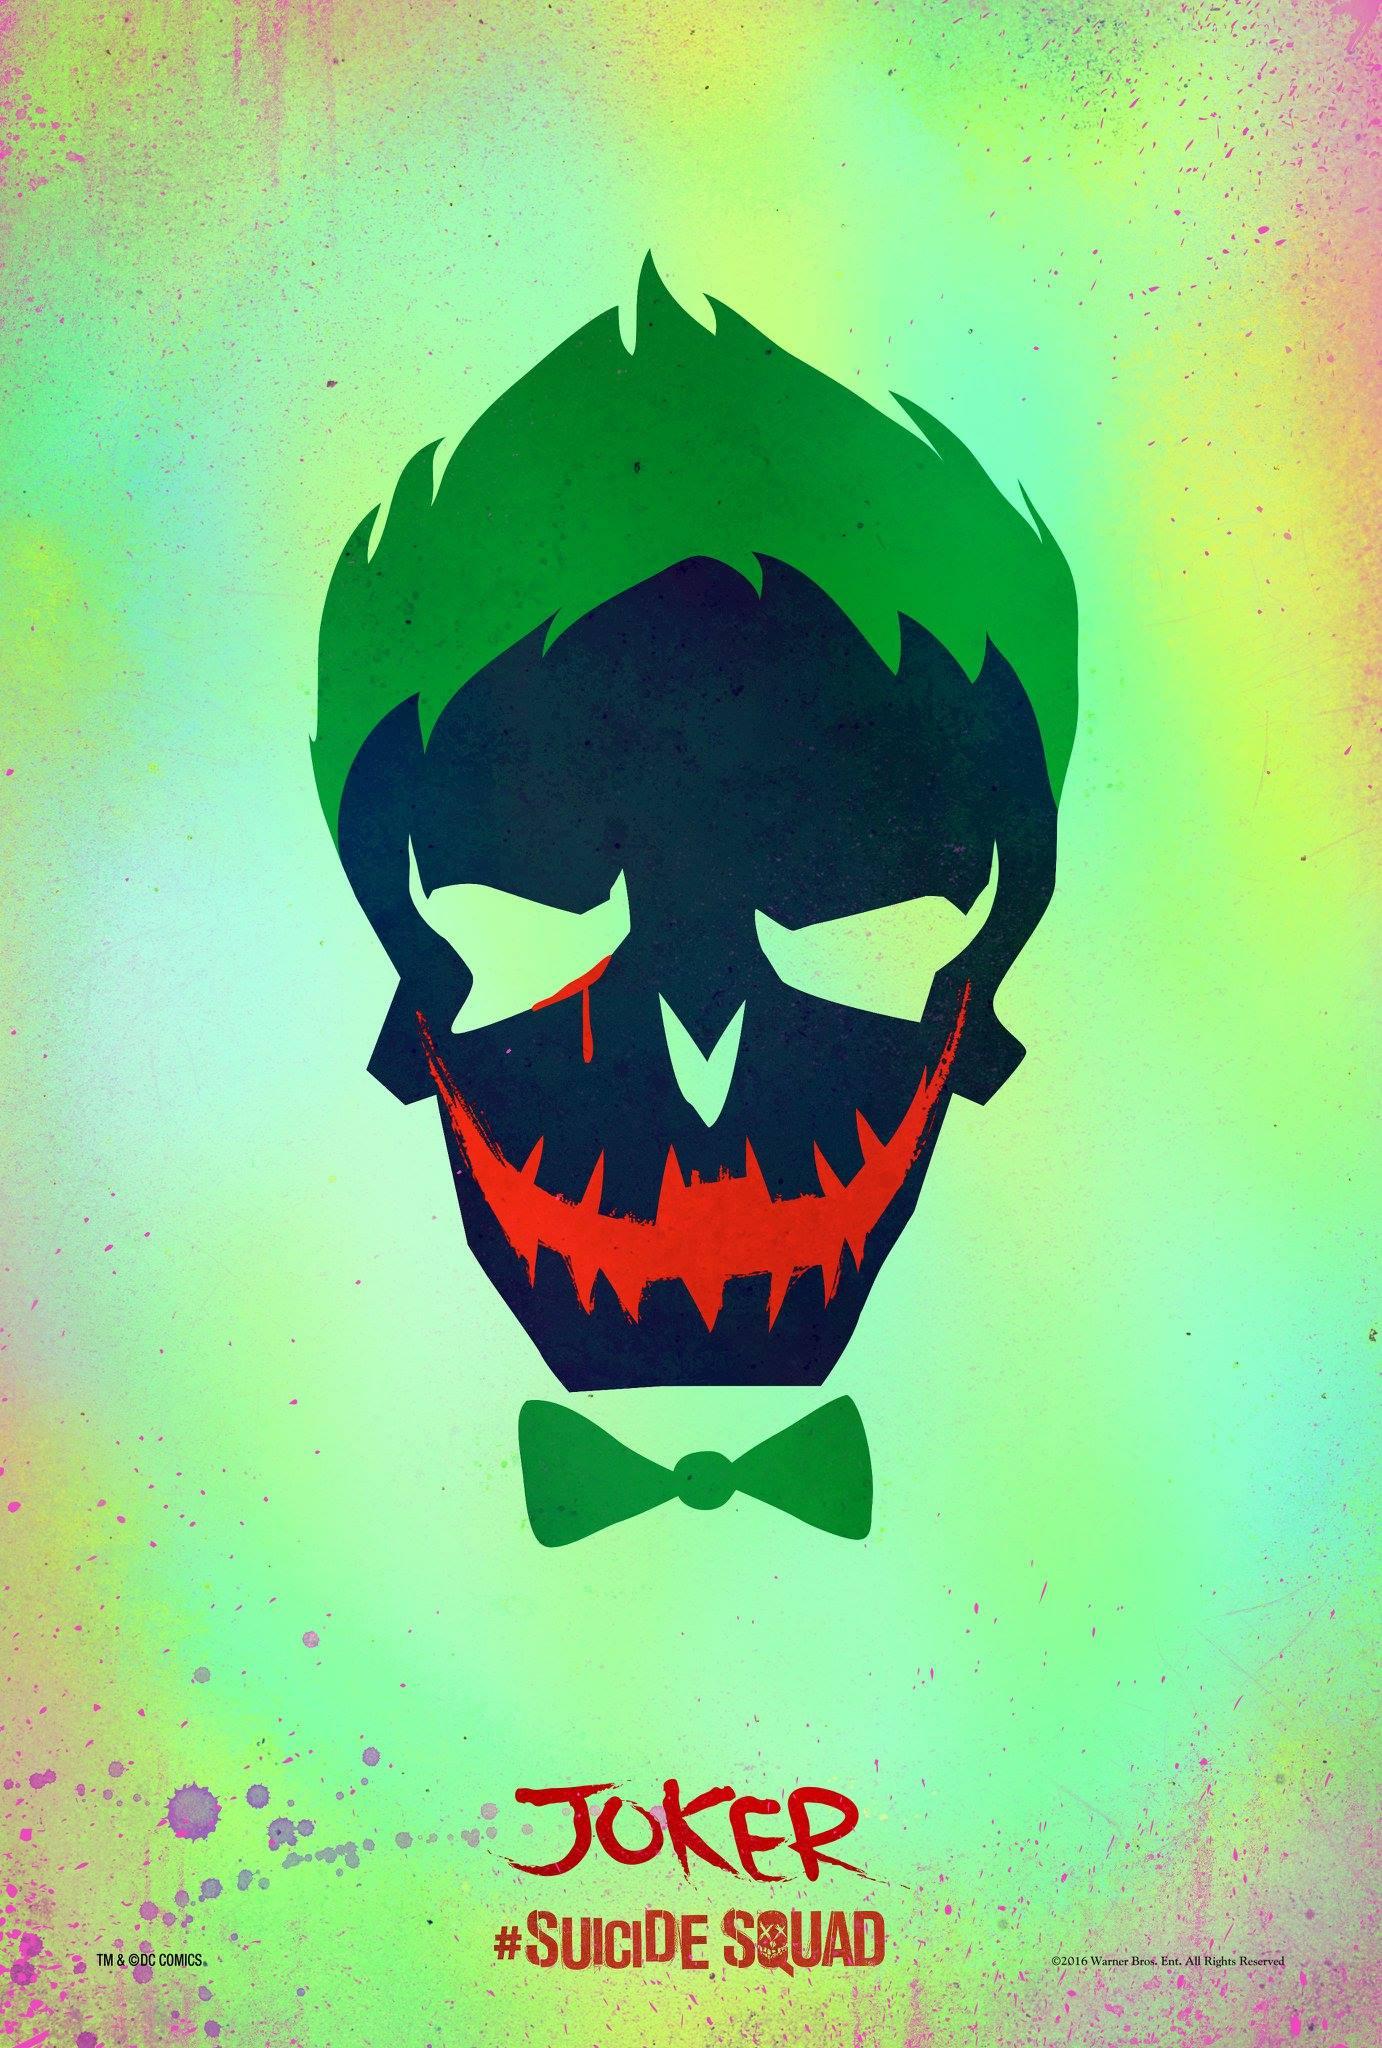 JokerPoster.jpg?fit=1382%2C2048&quality=